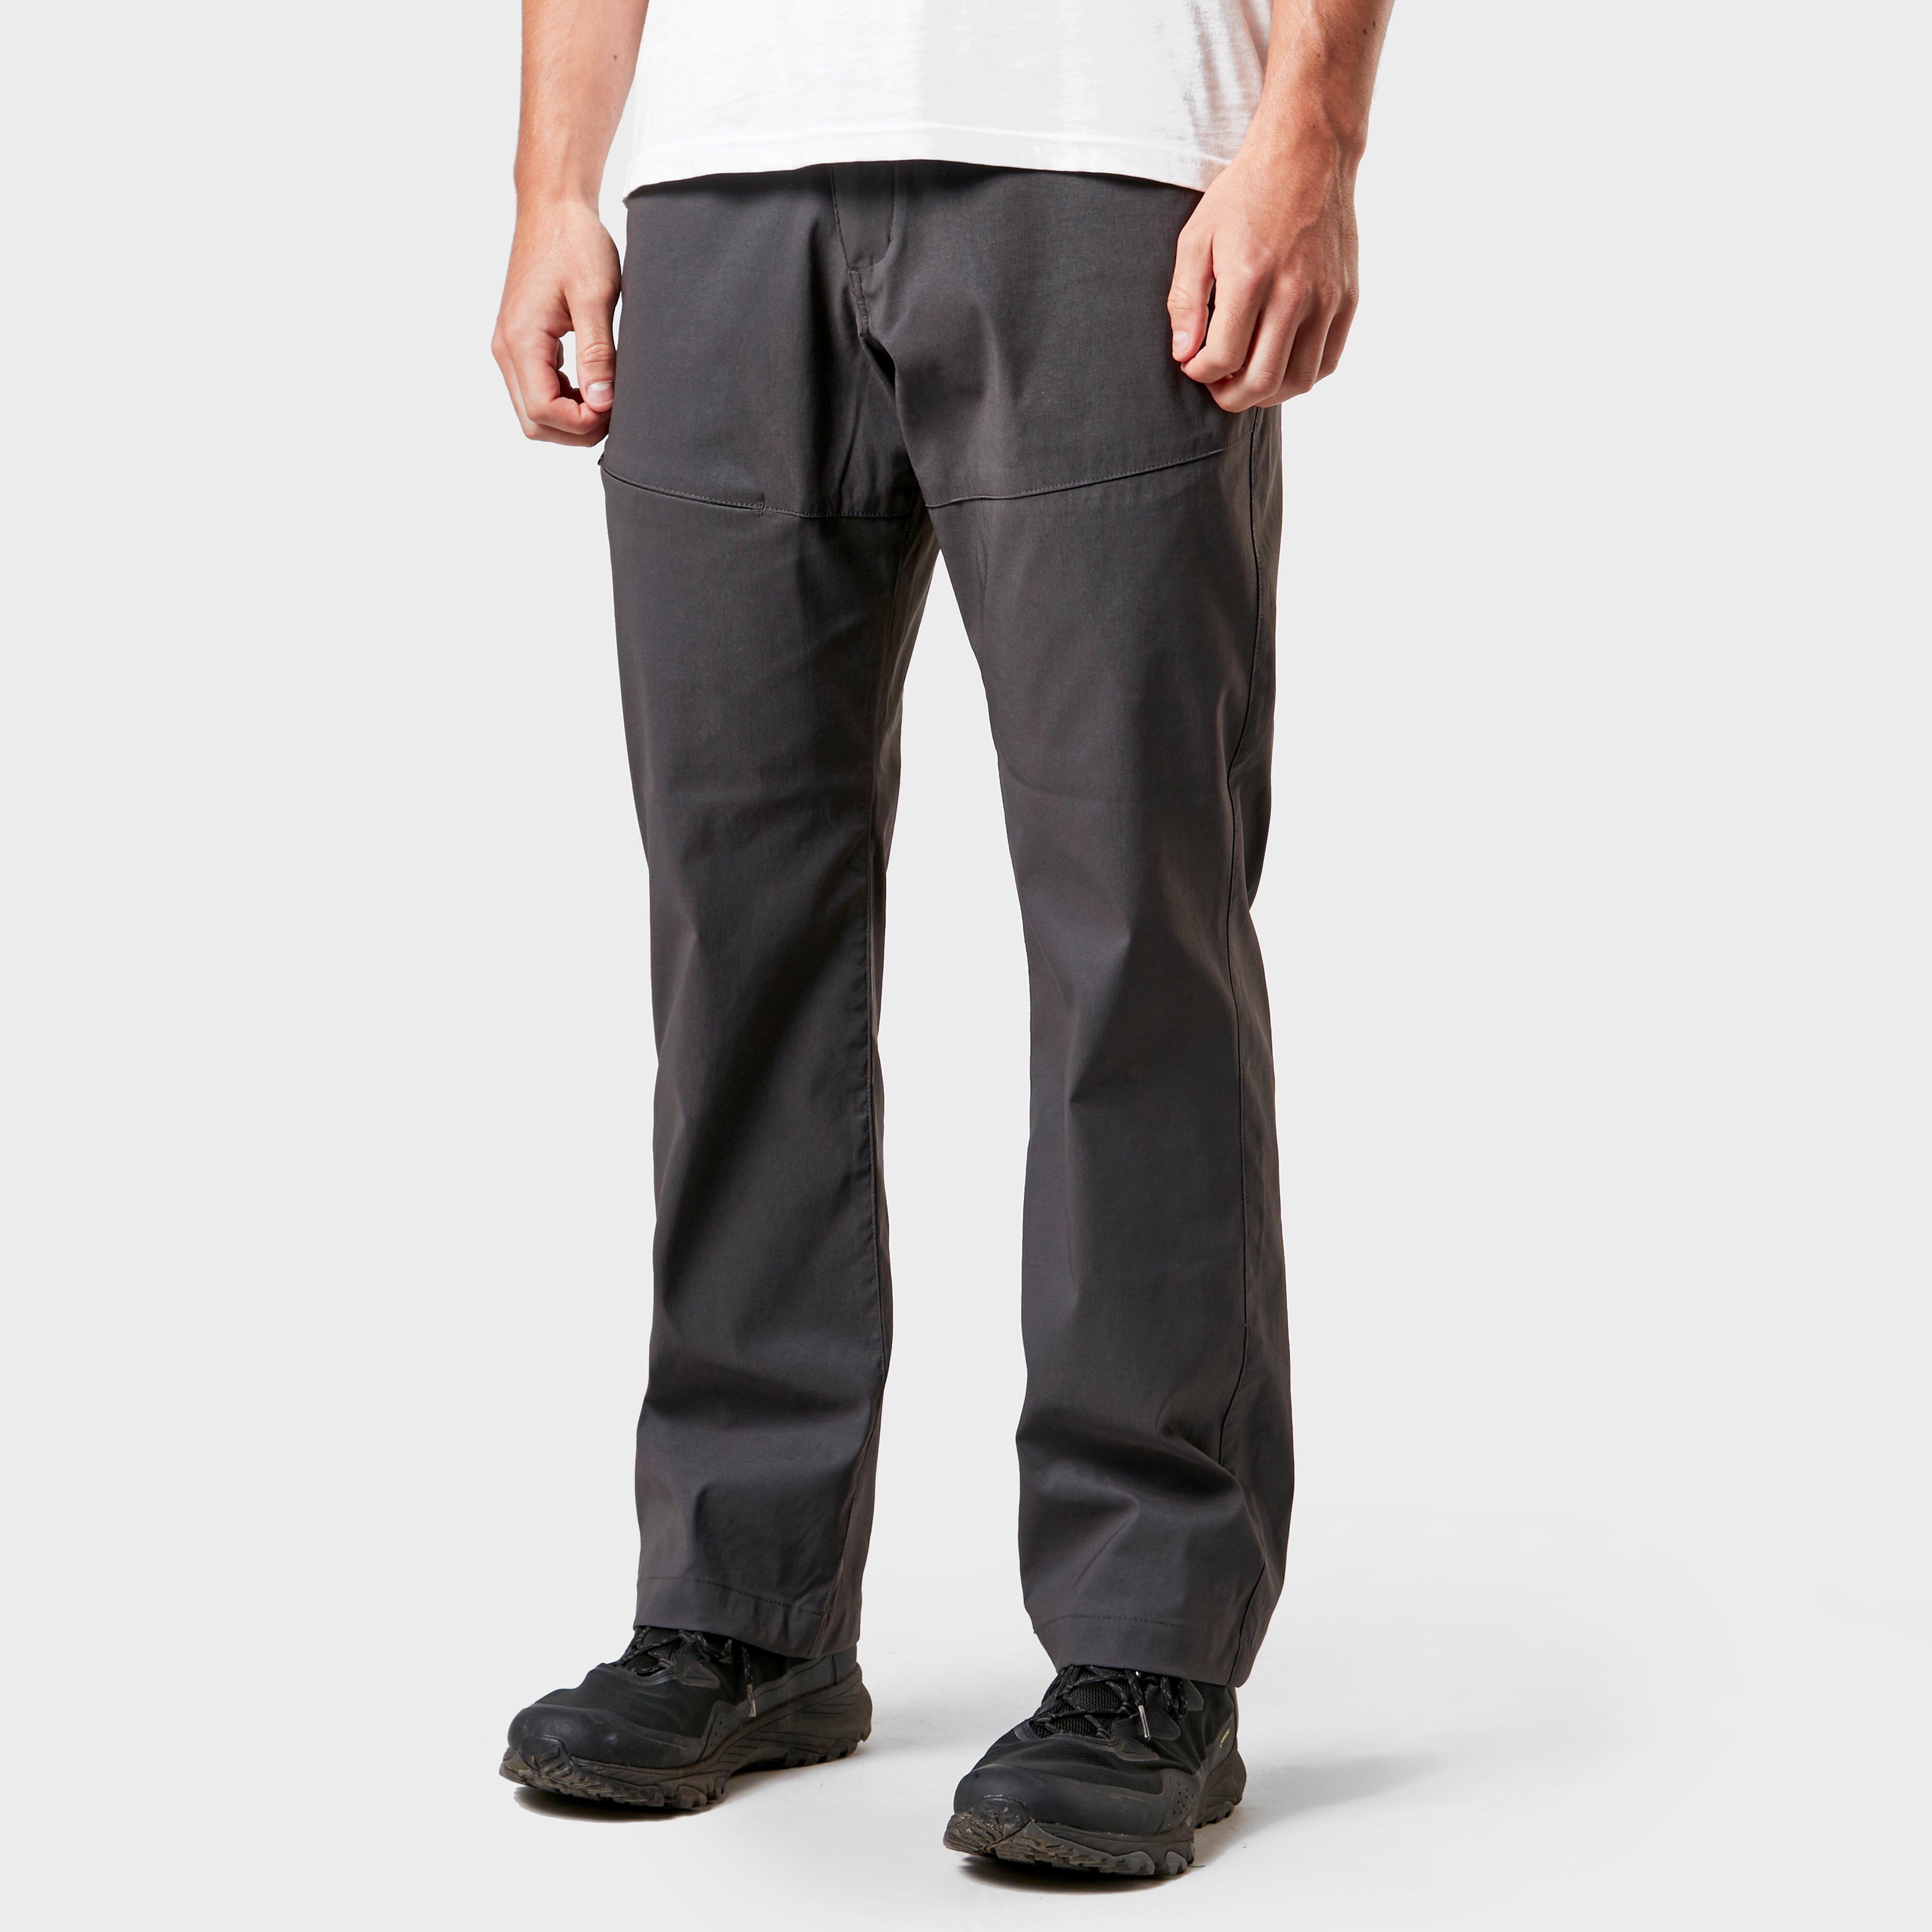 Craghoppers Craghoppers Mens Kiwi Pro II Trousers, Grey